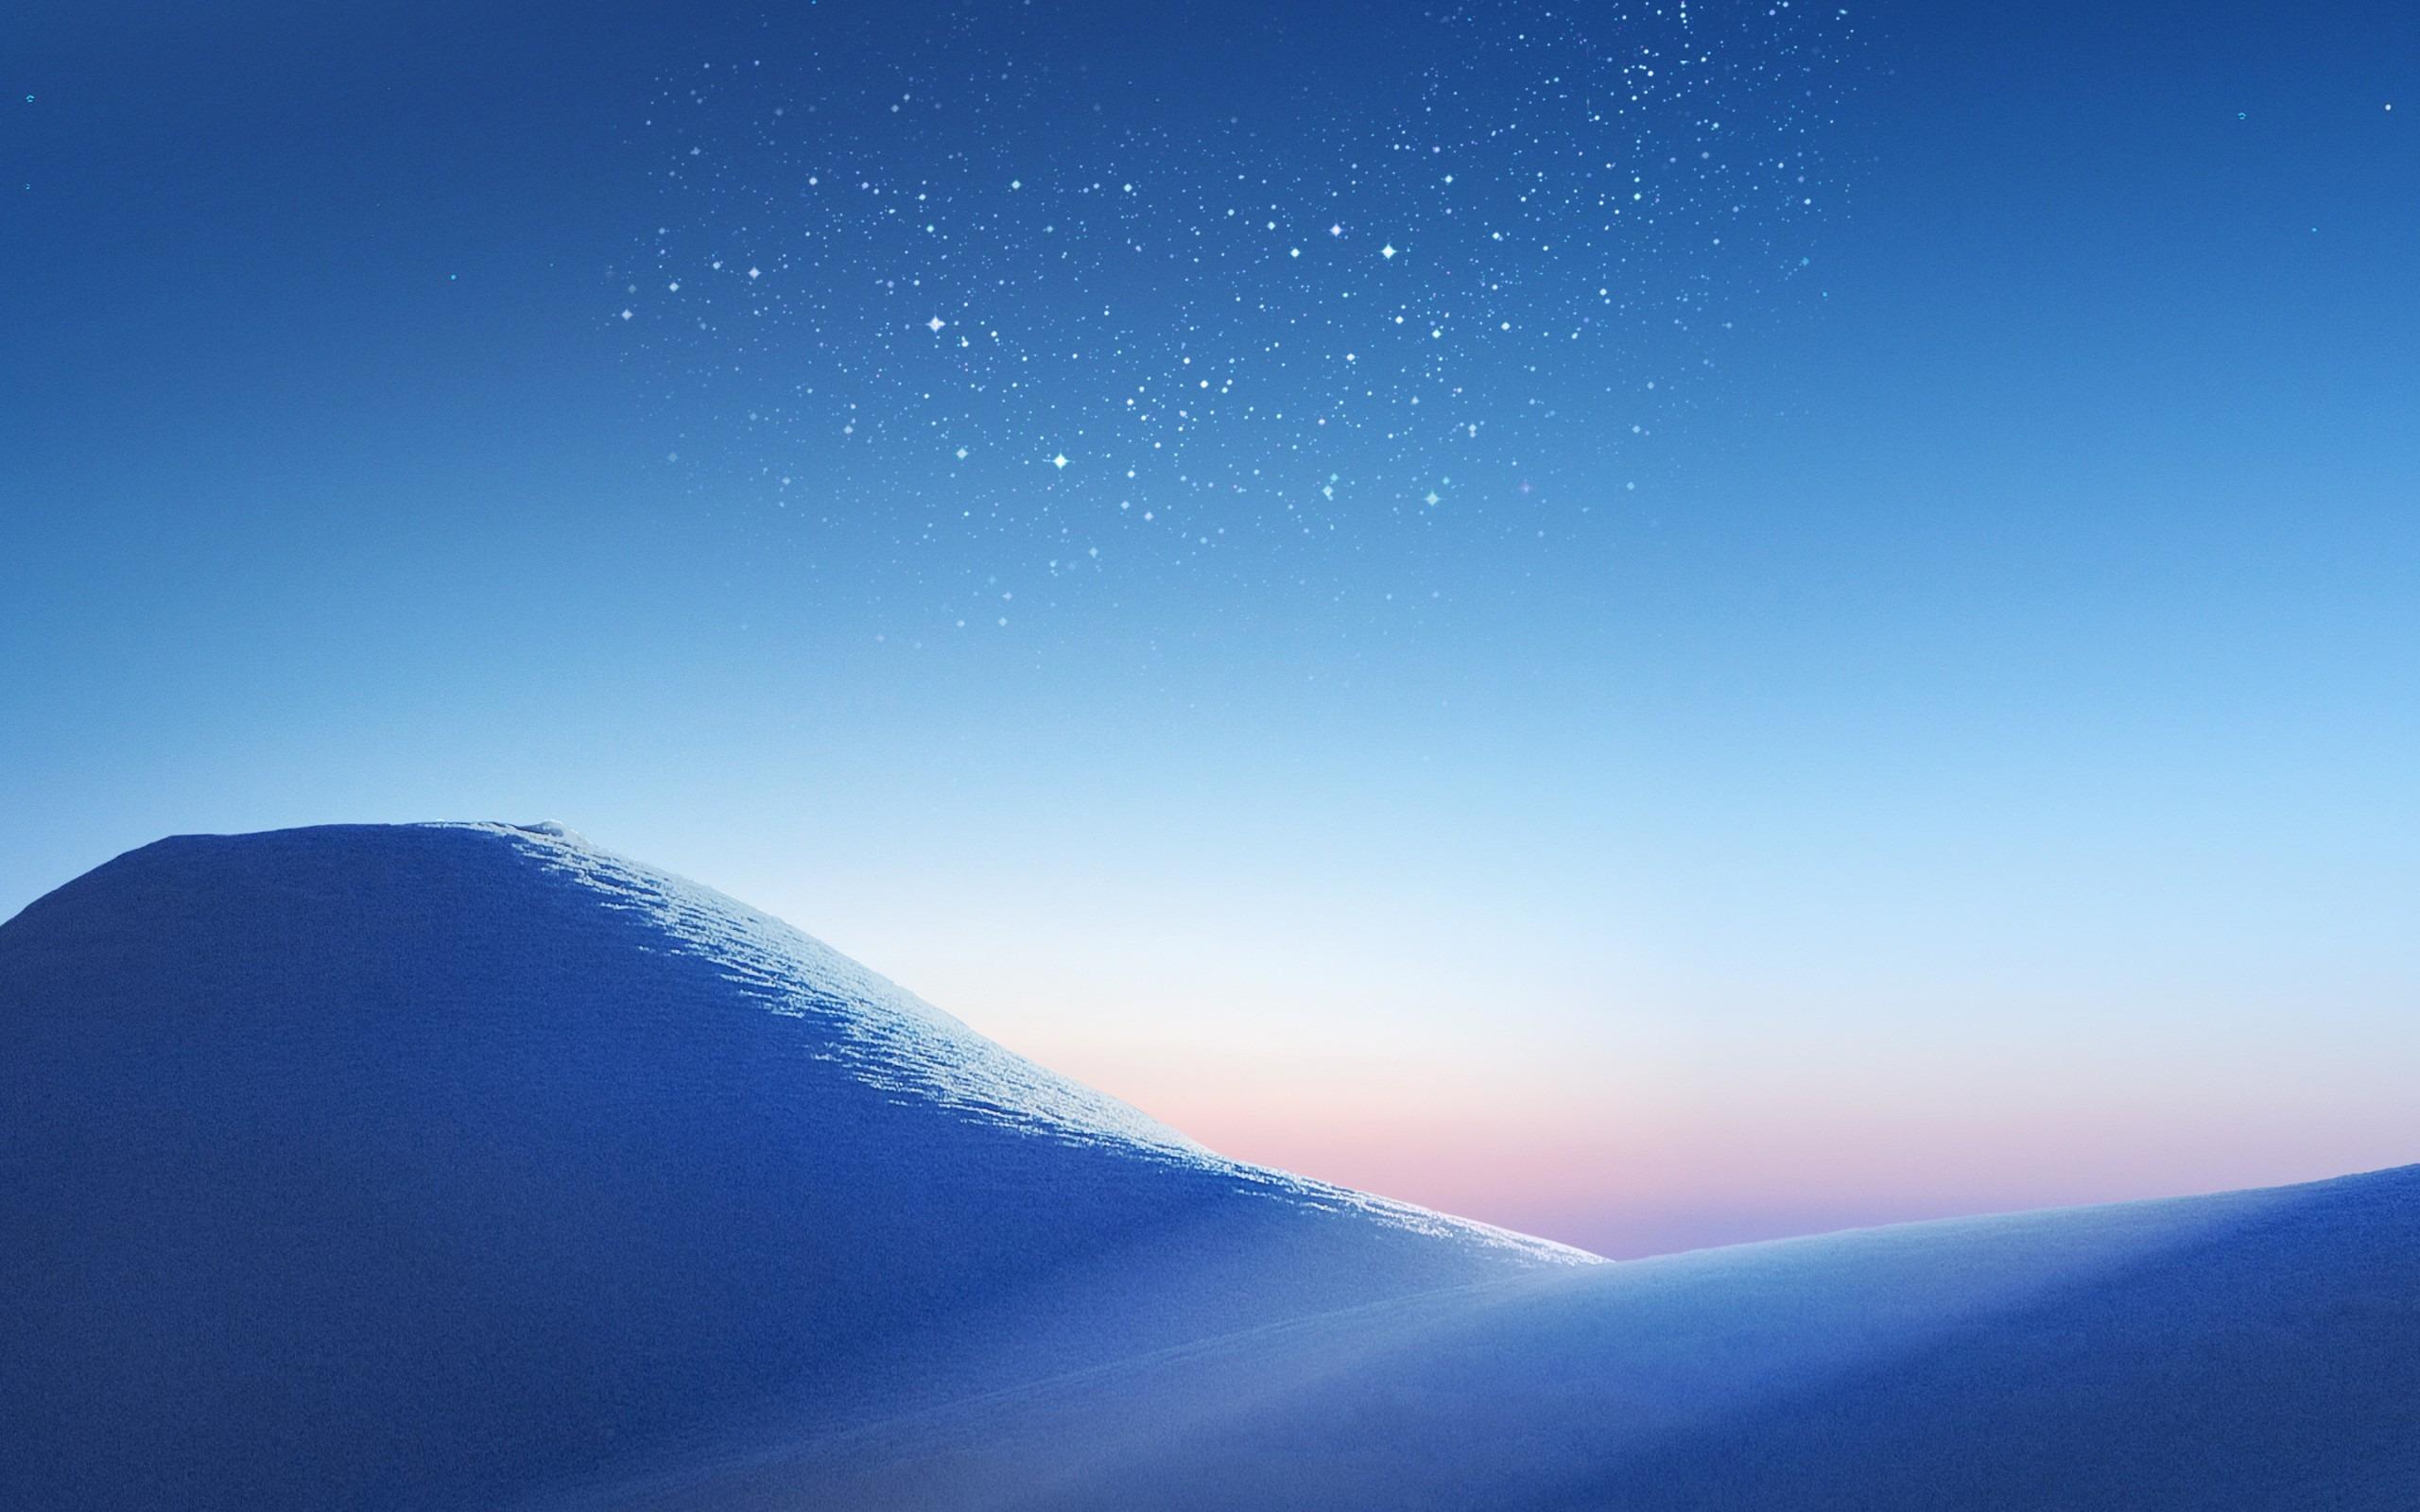 Samsung Galaxy Note 8 Desktop Wallpaper Preview 10wallpaper Com